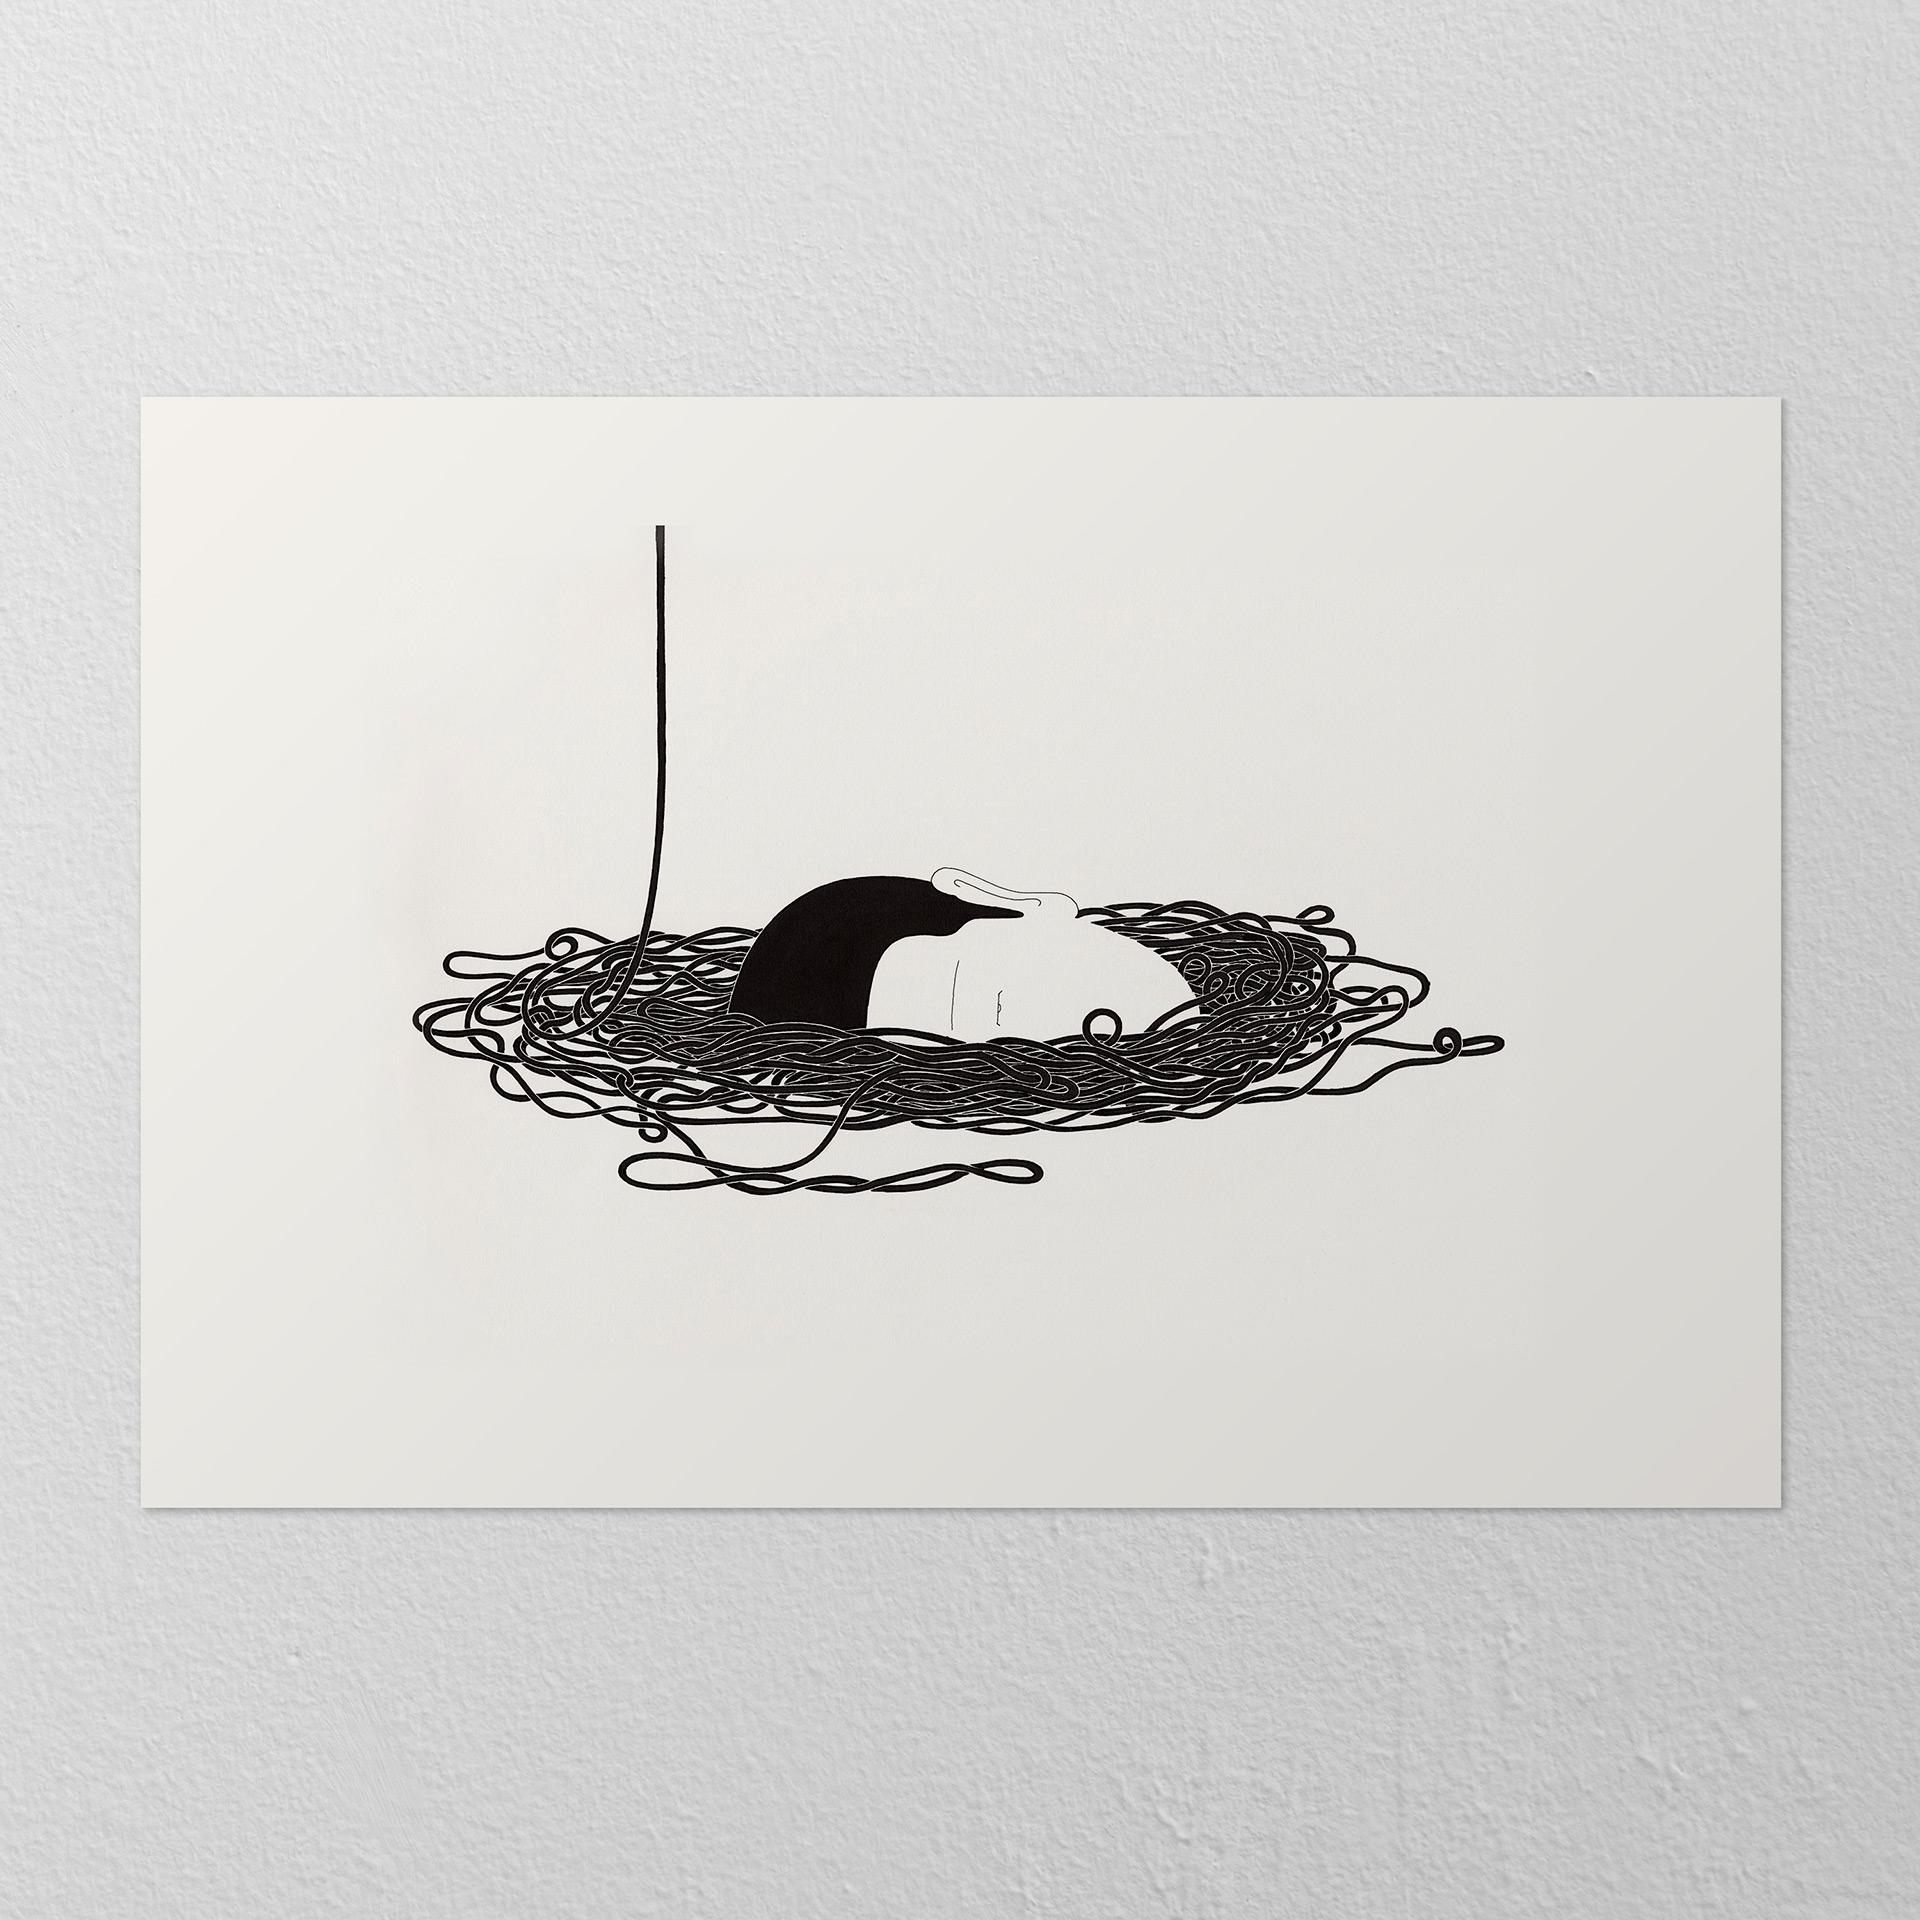 0074CS-3_DaelimMuseum_Troika_Floating-head_2014_WALL_WEB.jpg